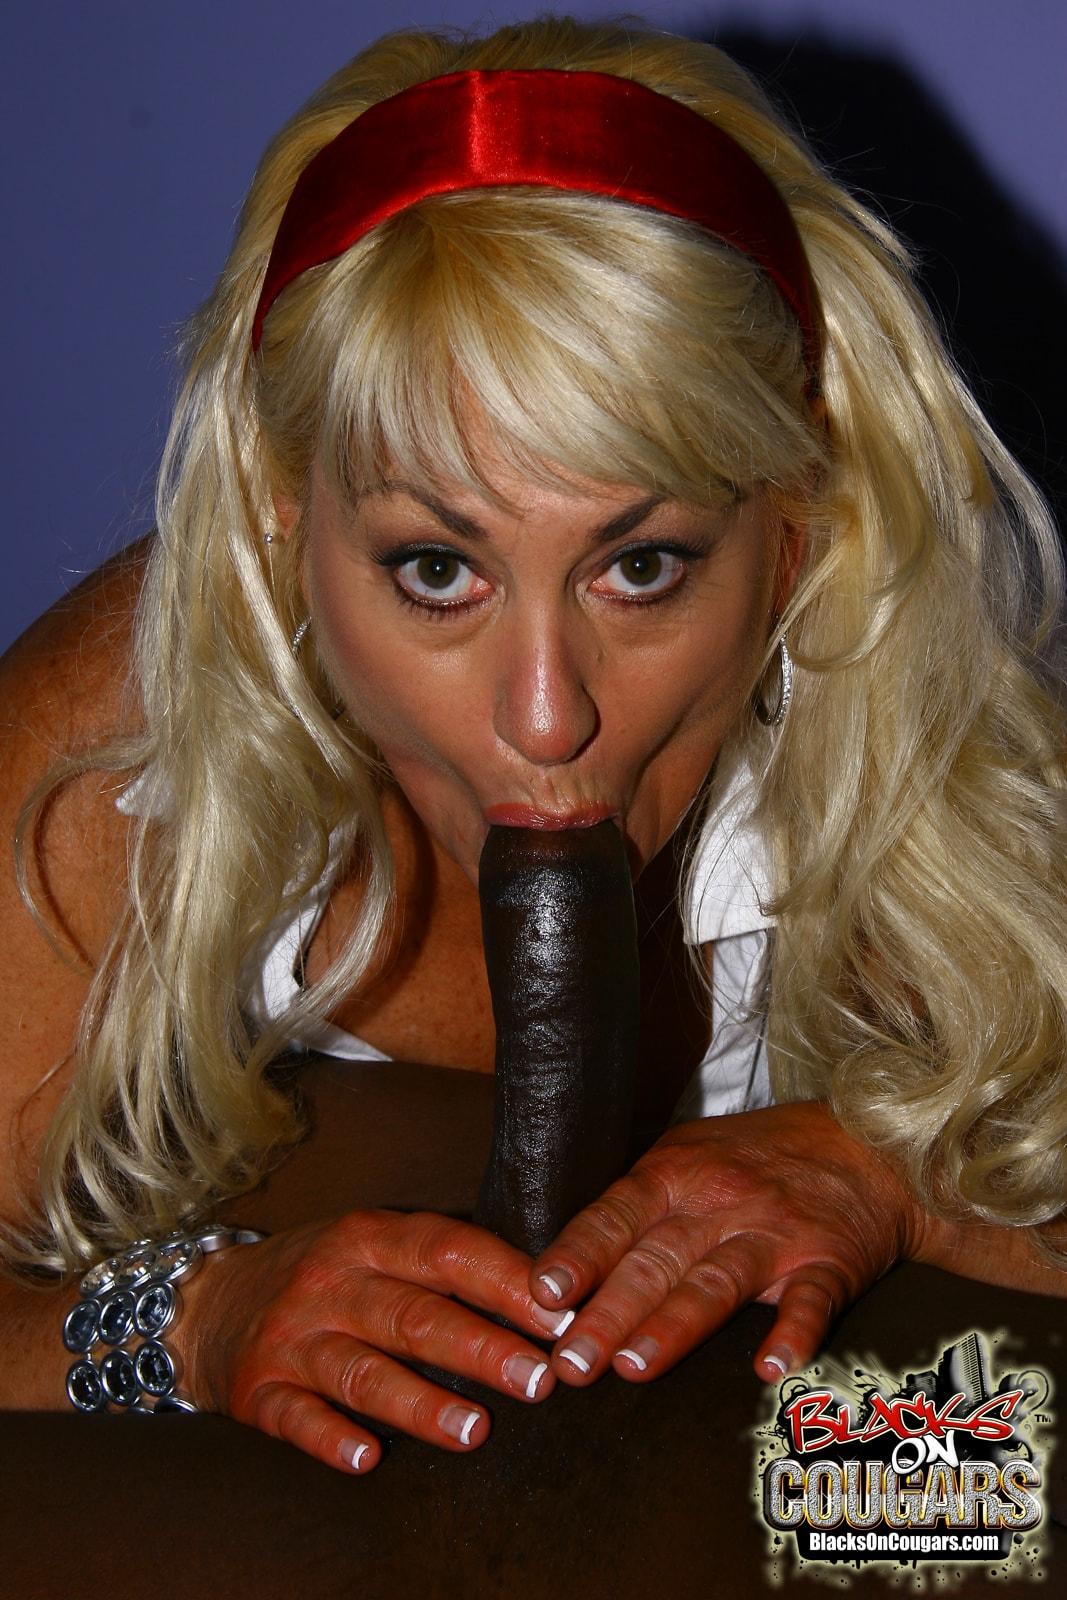 Dogfart '- Blacks On Cougars' starring Dana Hayes (Photo 14)